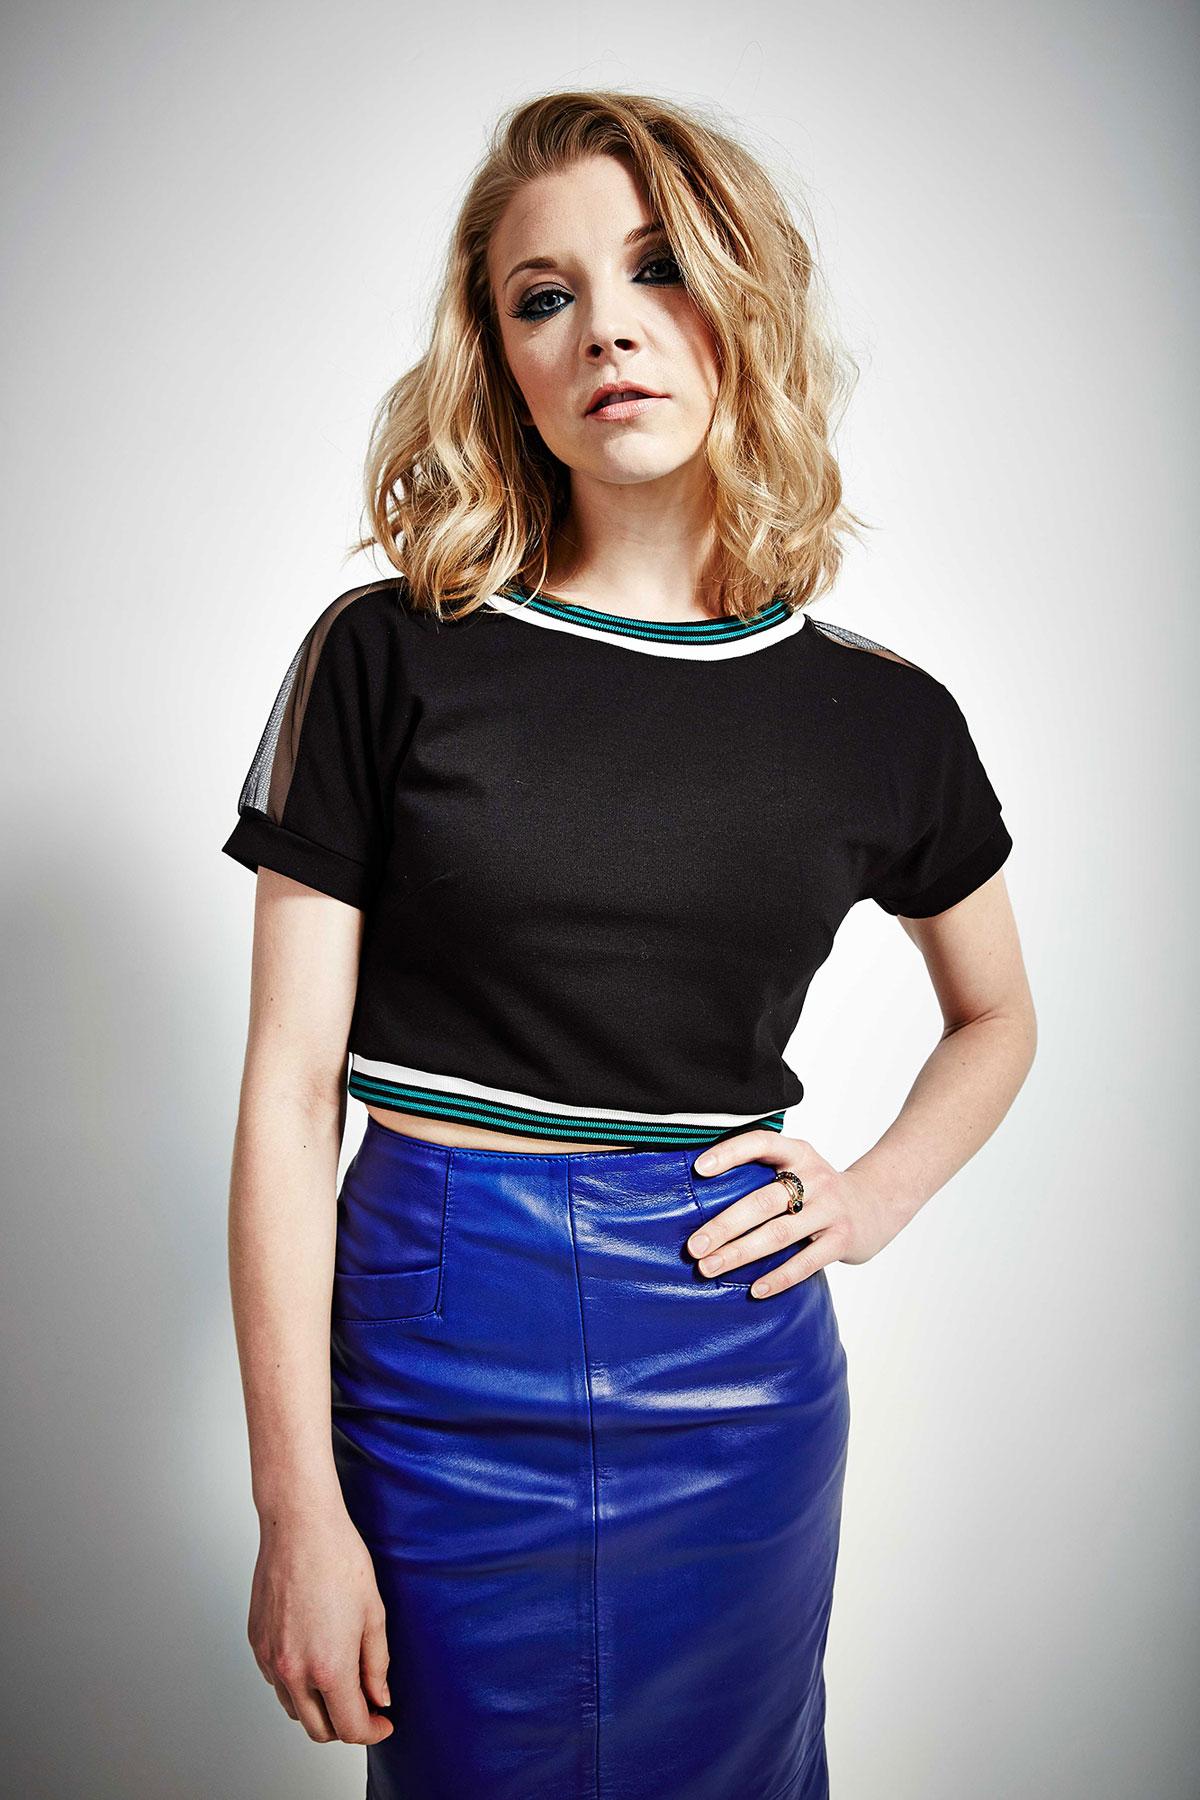 Natalie Dormer - Richard Grassie photoshoot for Radio Times